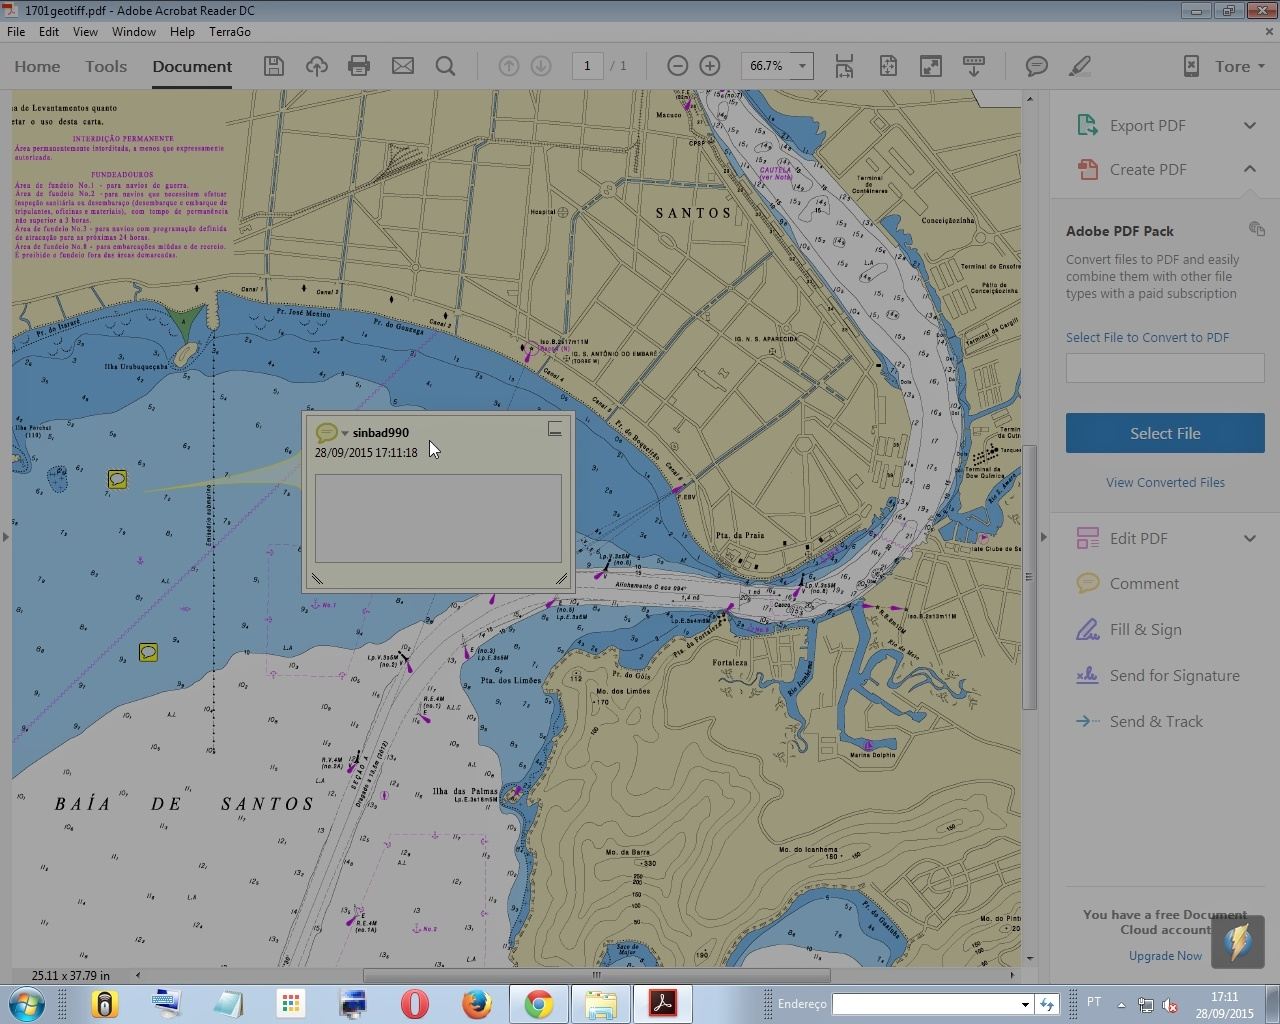 Click image for larger version  Name:1701geotiff.pdf - Adobe Acrobat Reader DC 2015-09-28 17.11.30.jpg Views:88 Size:393.1 KB ID:110118